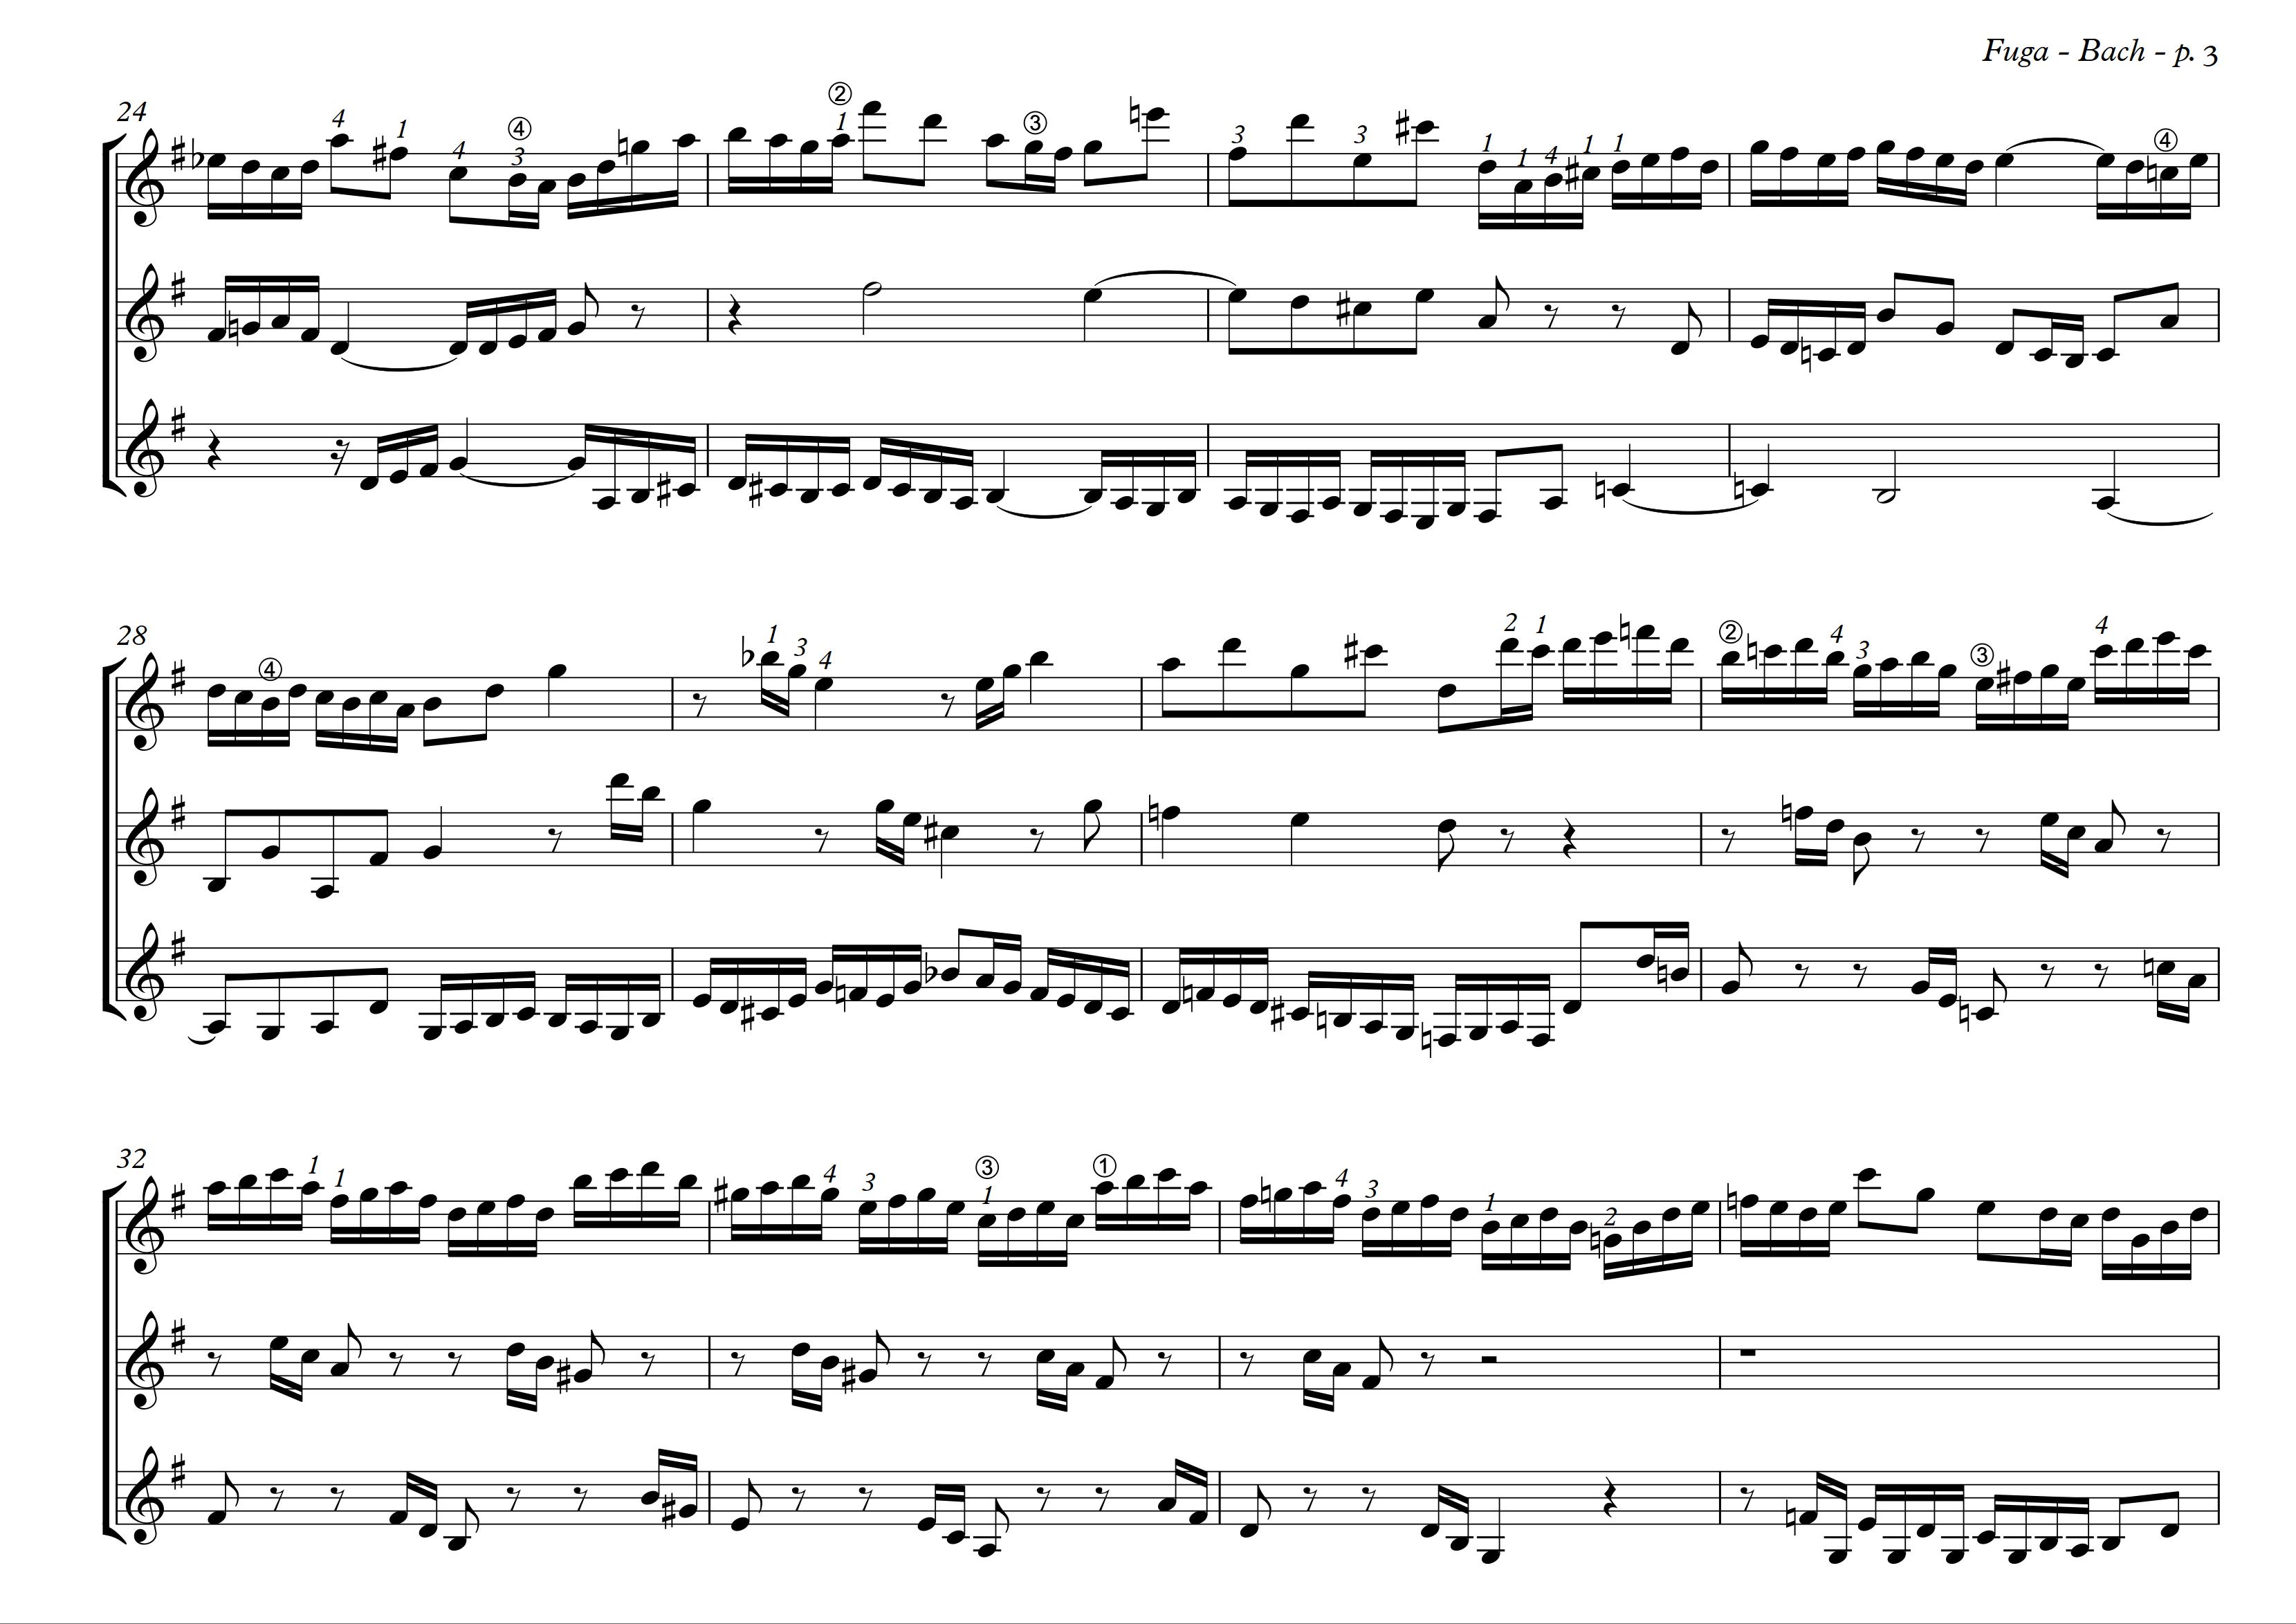 Fuga - Bach - Maximo Barbieri -3